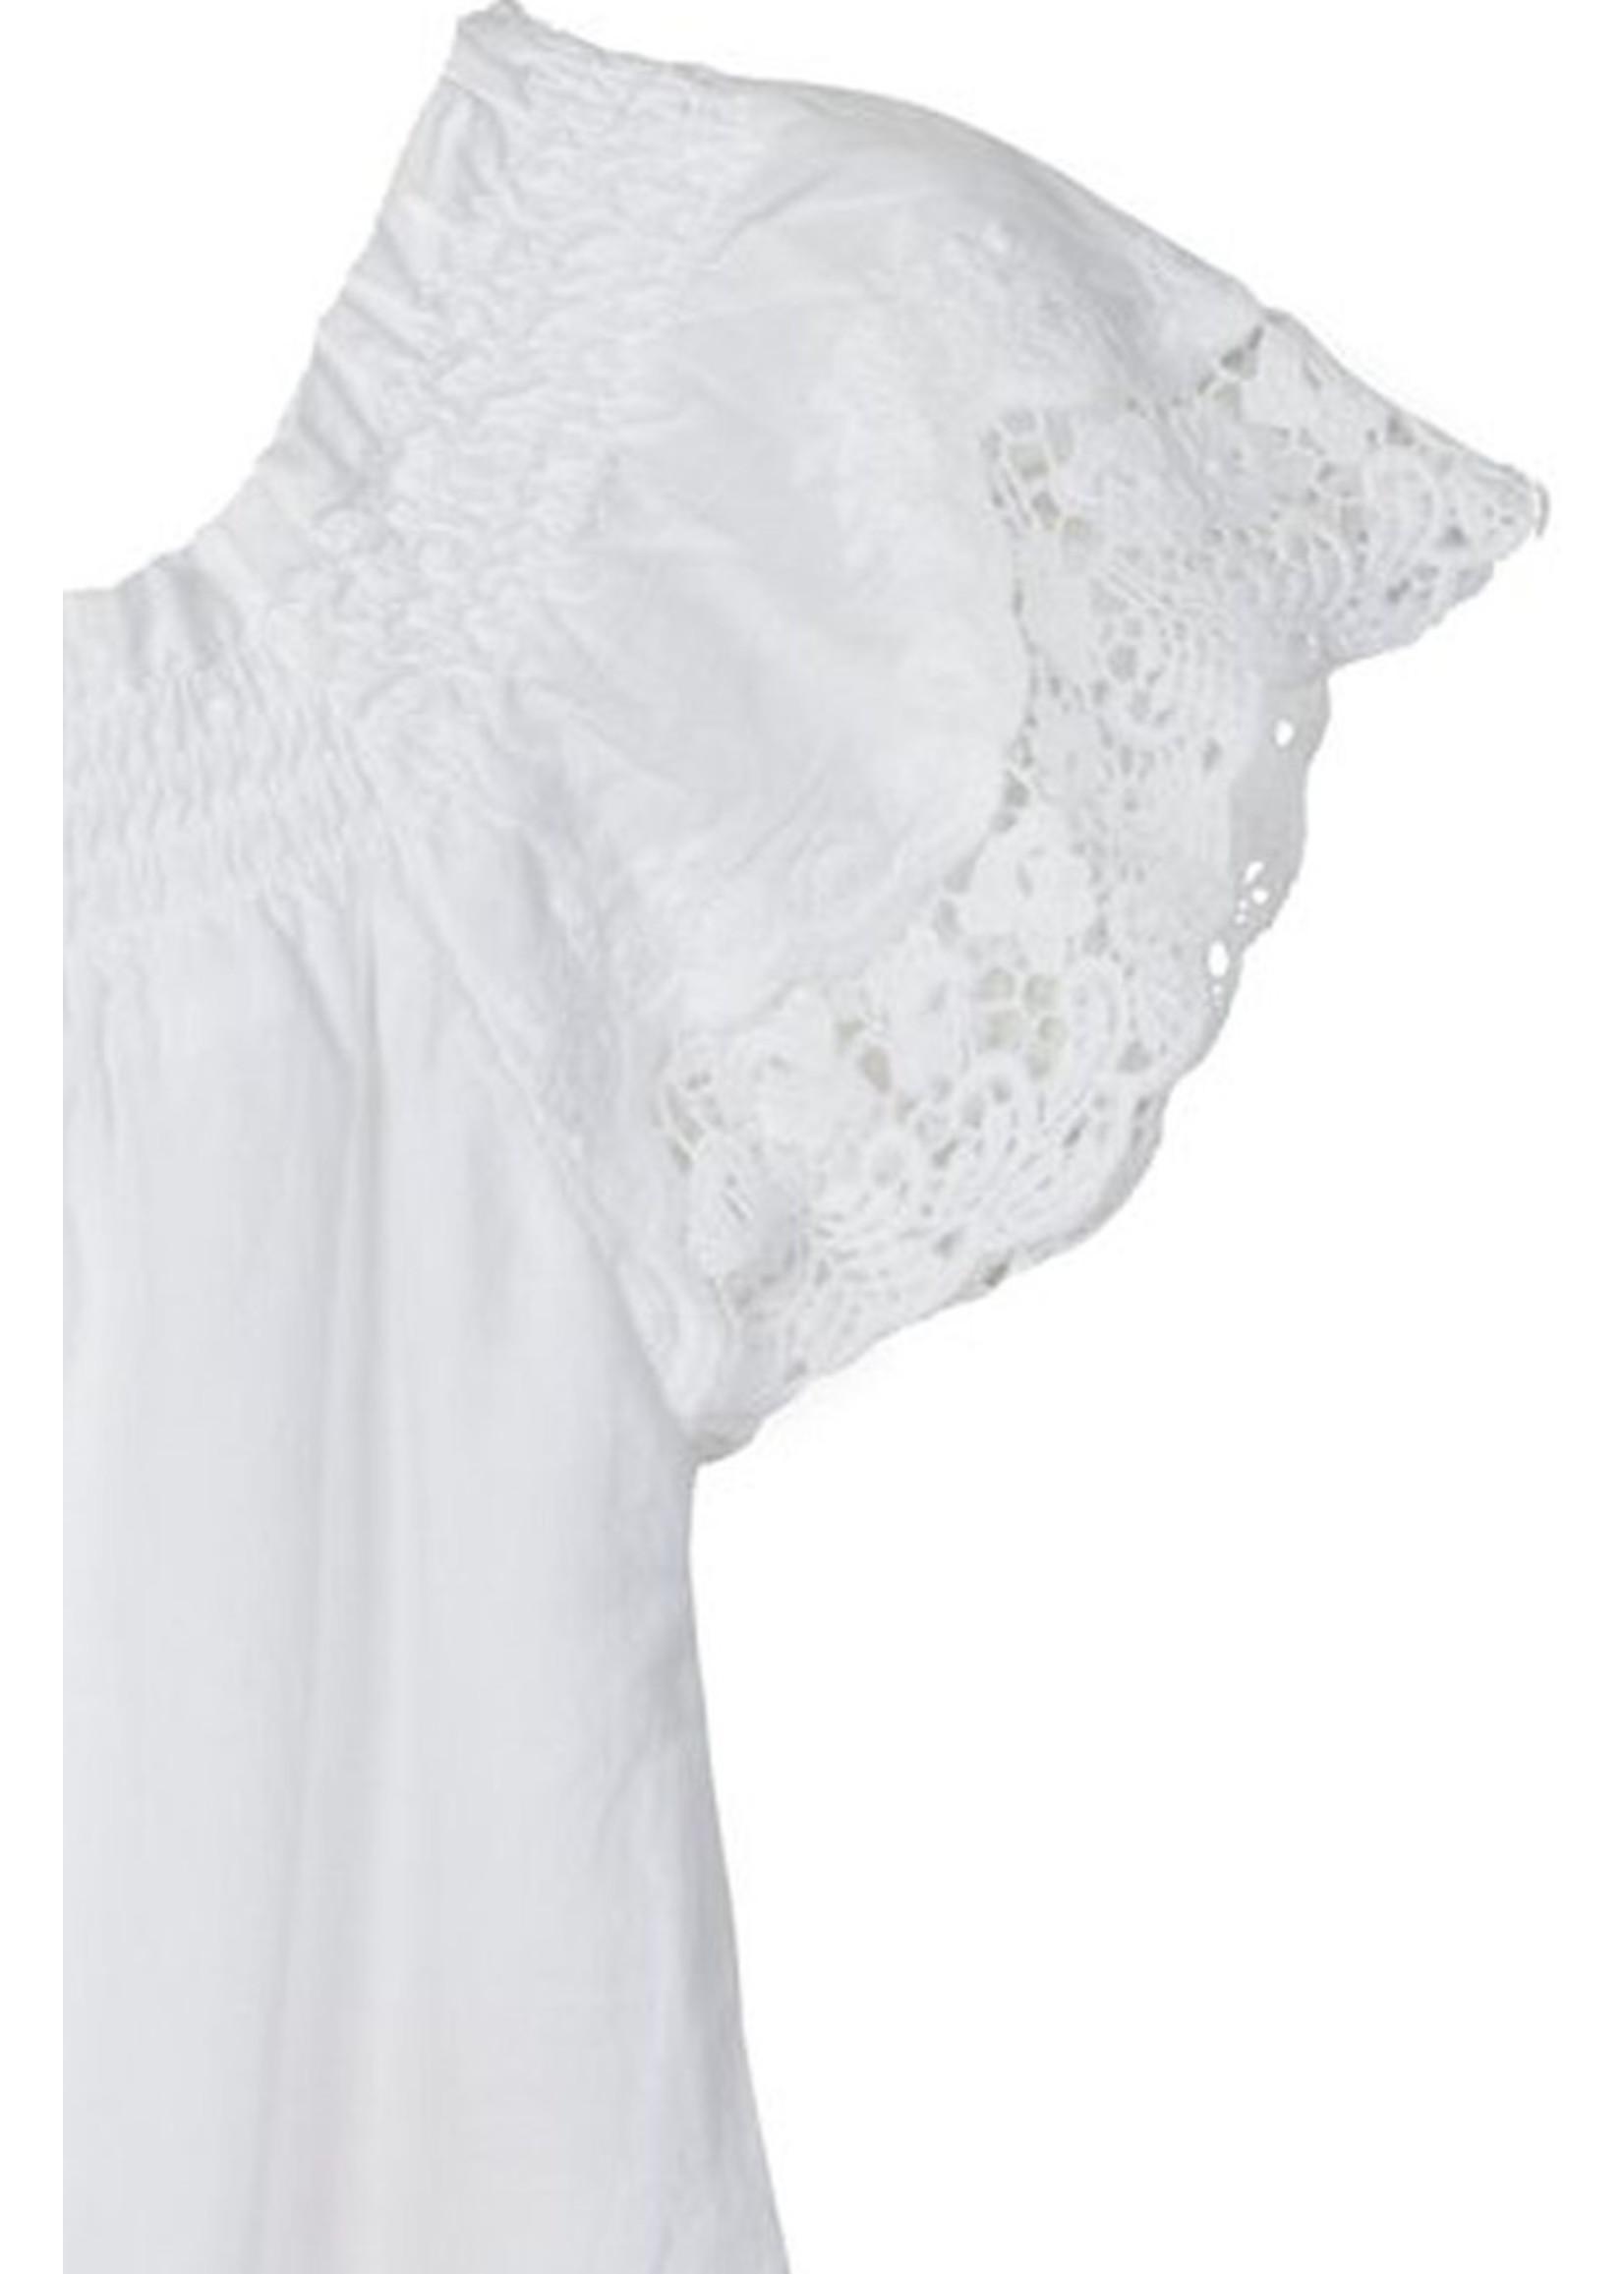 Name it shirts maat 116 + 122/128